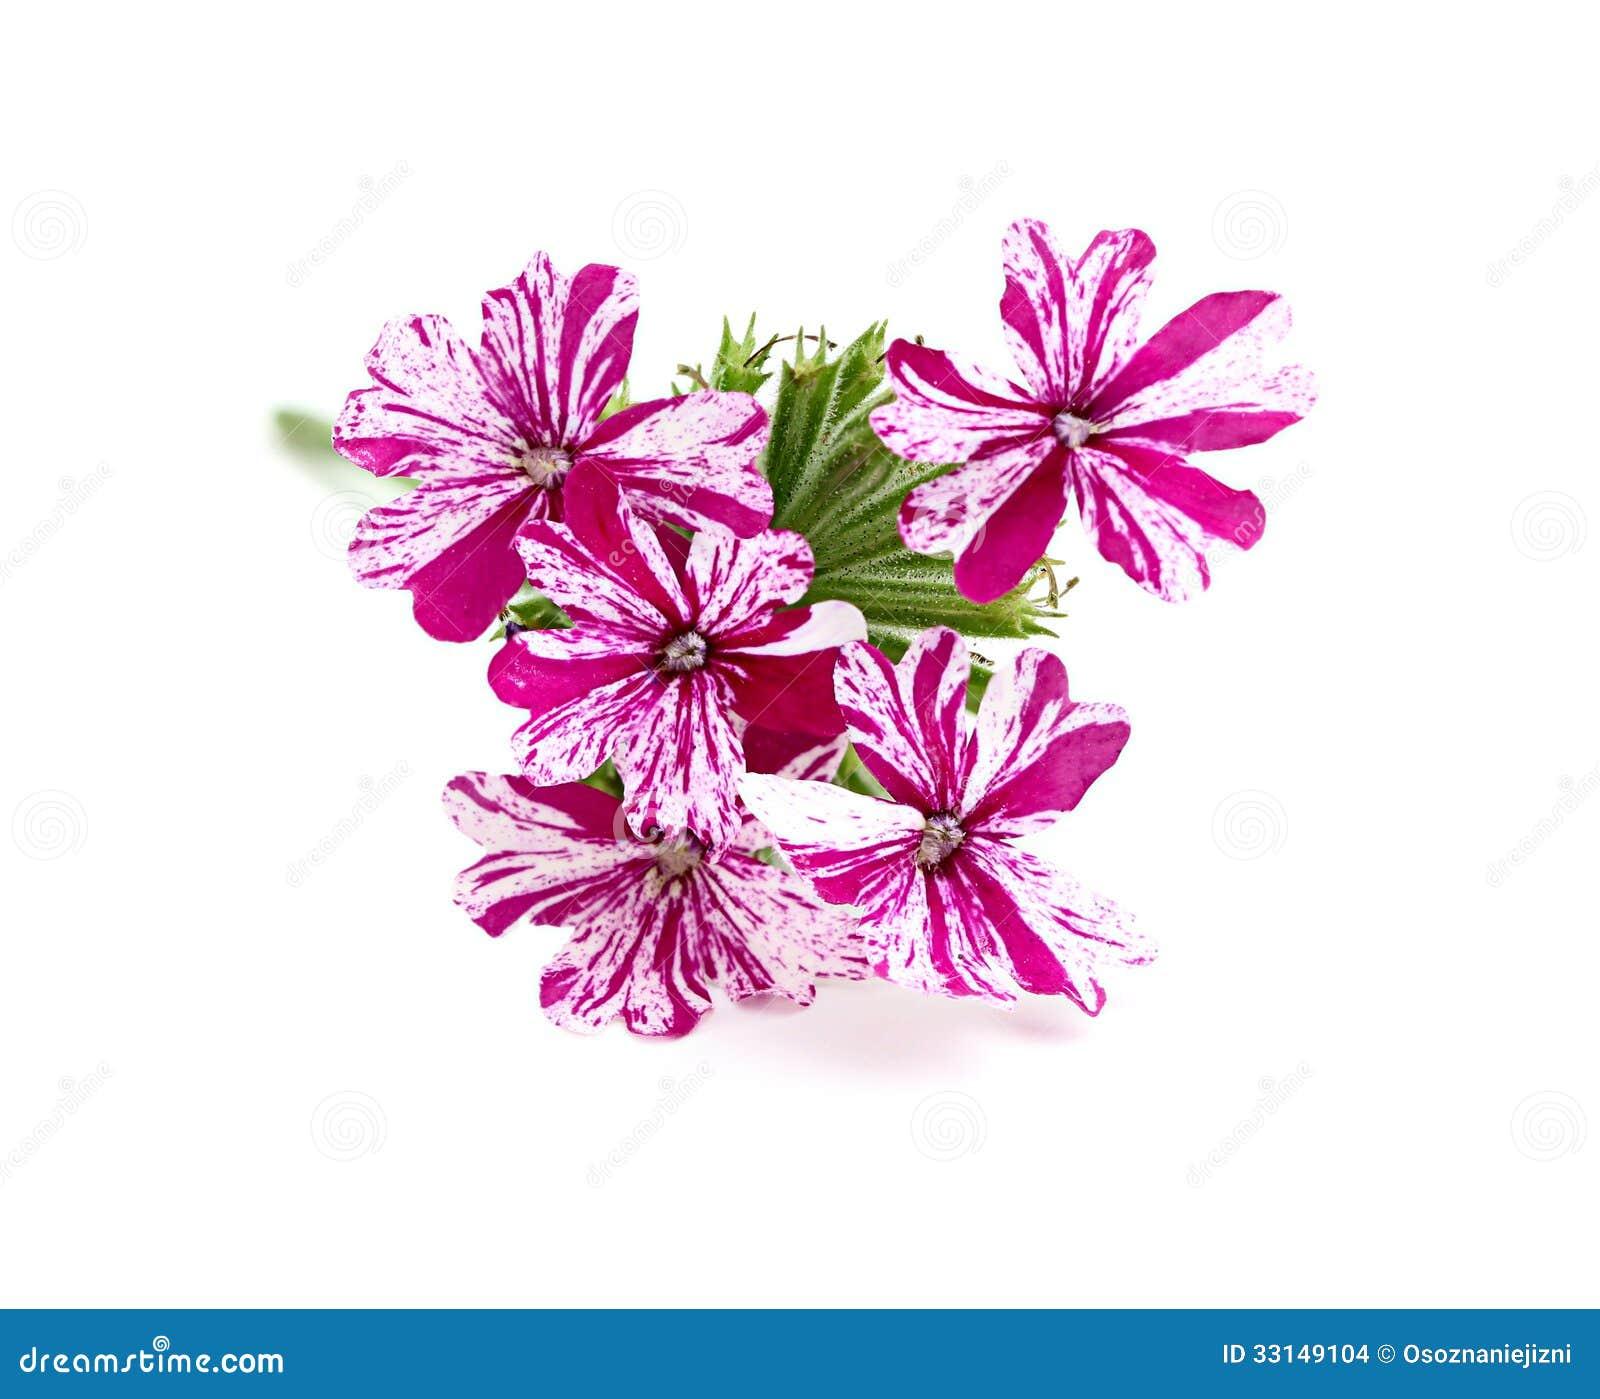 verveine rose de fleur images stock - image: 33149104